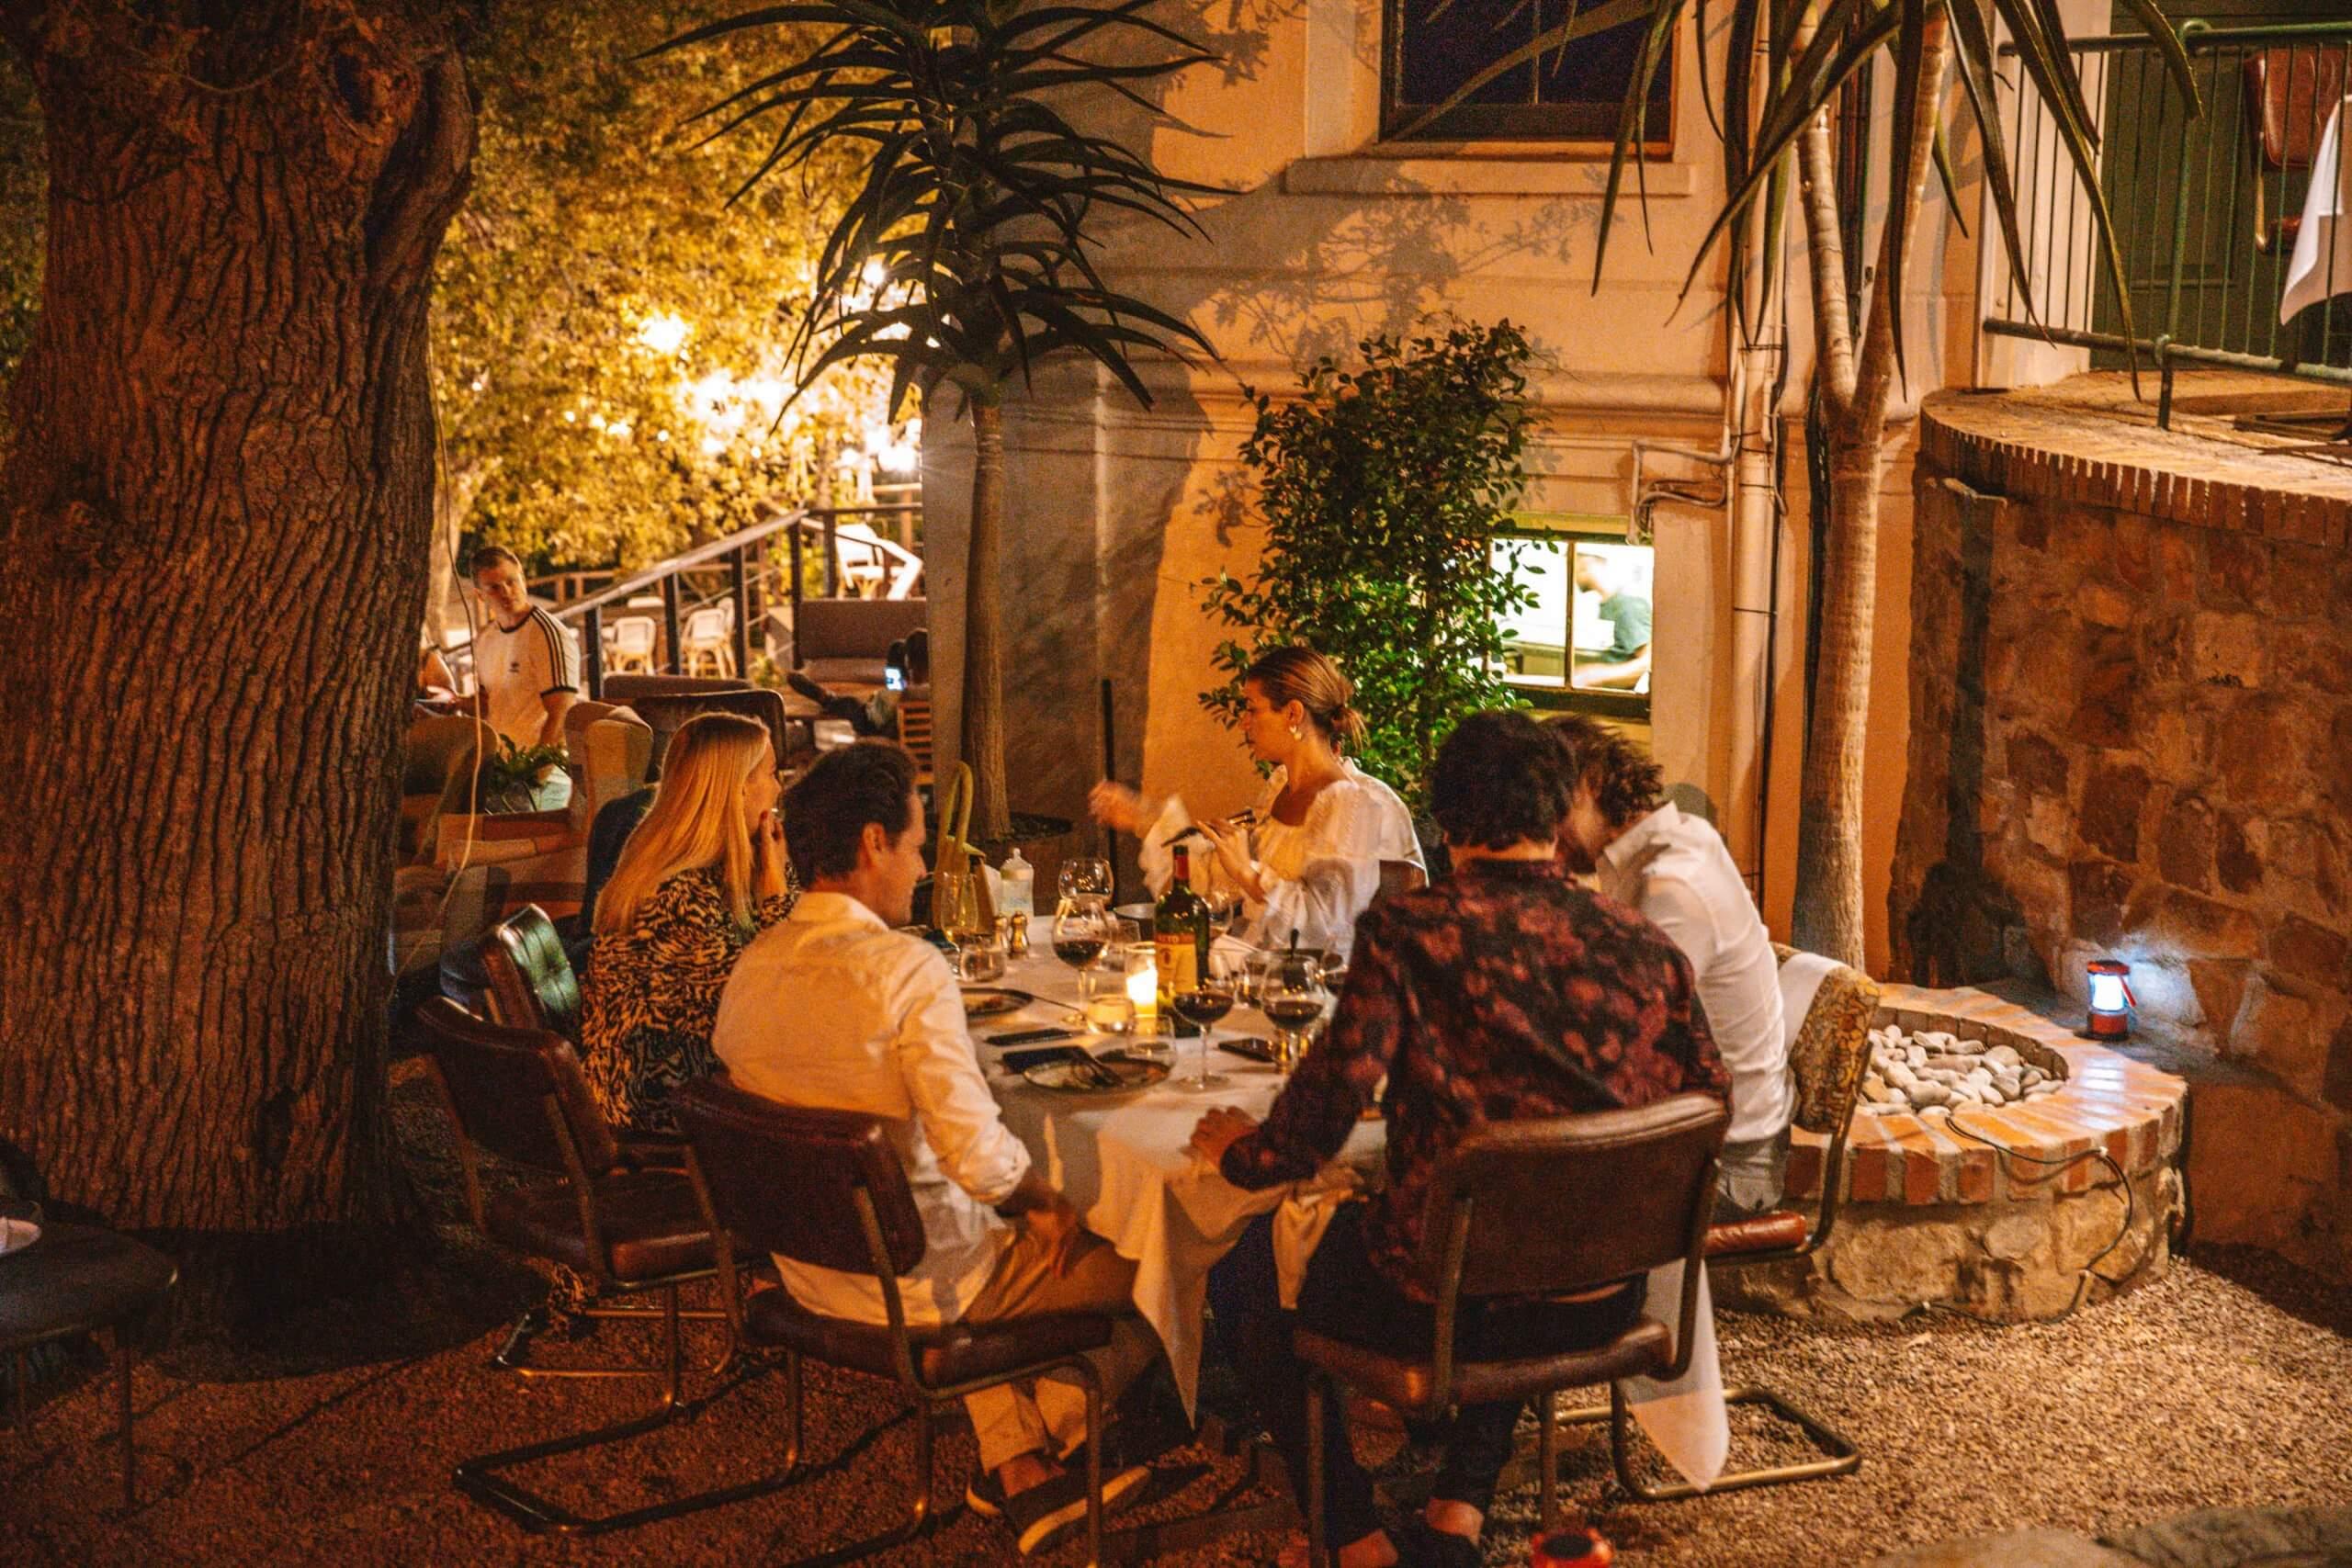 kapstaden roundhouse restaurang tips-6